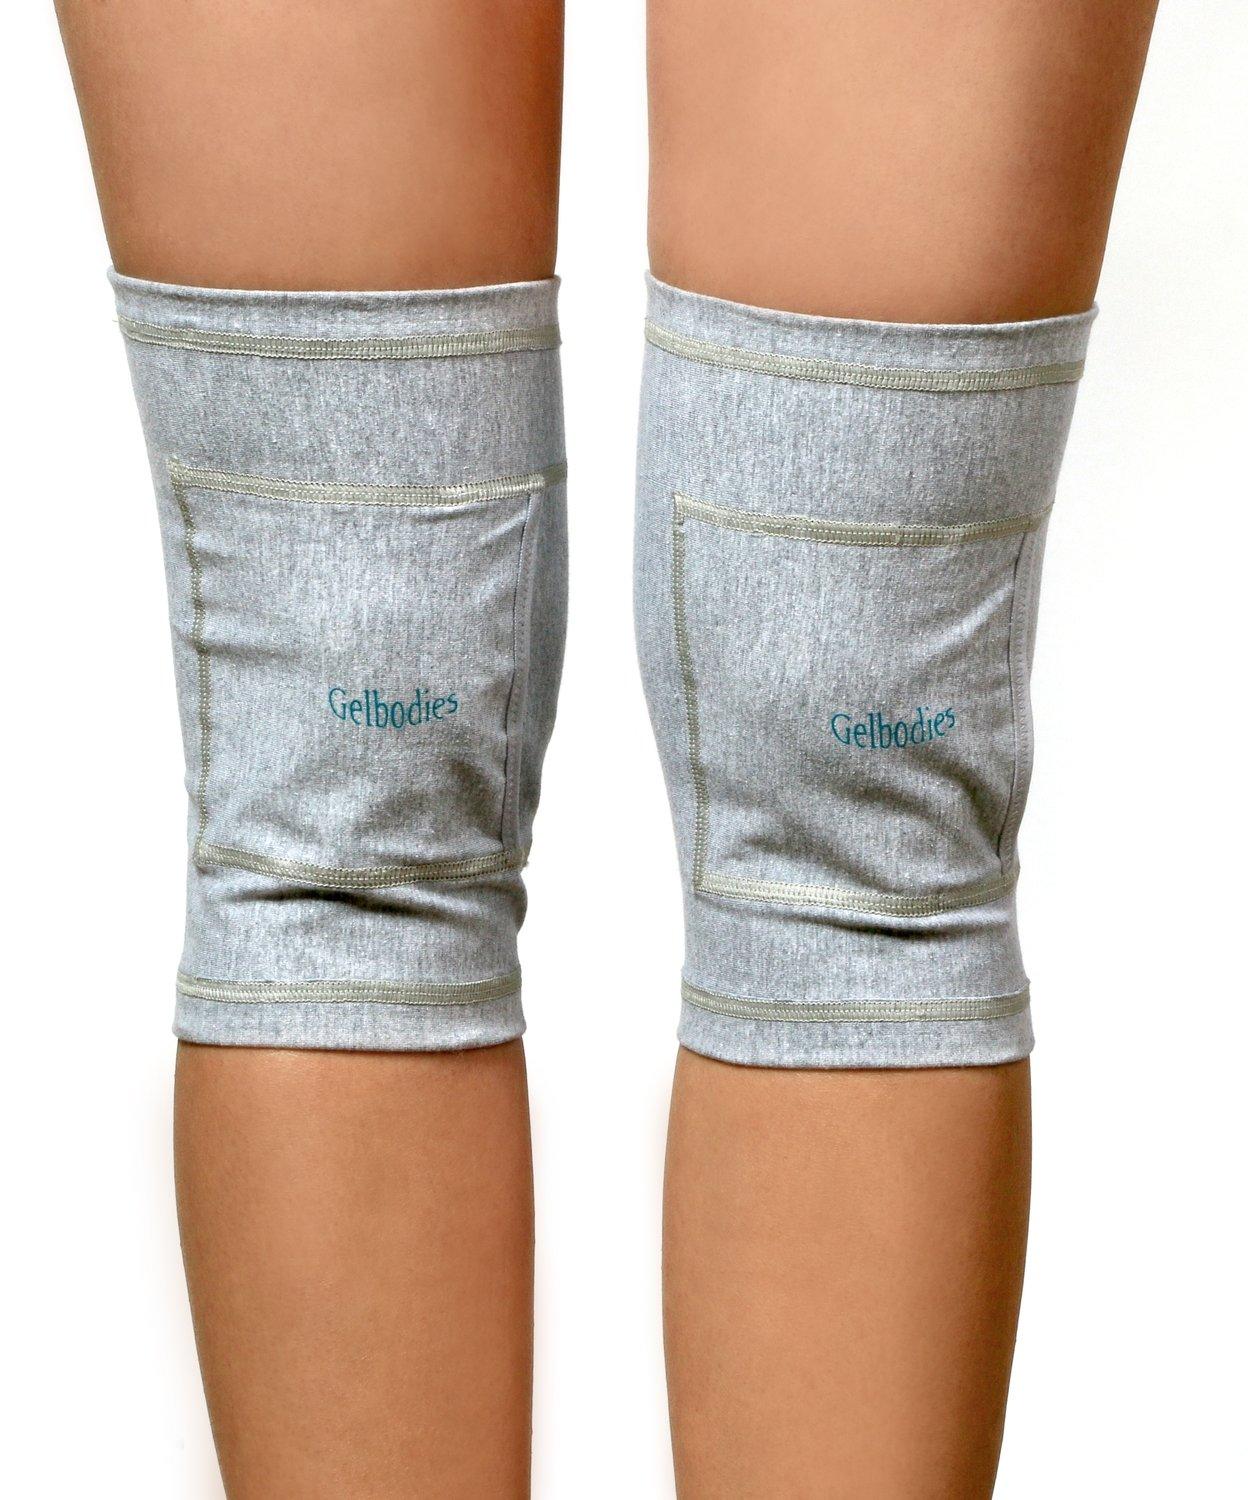 GelBodies Knee Protection